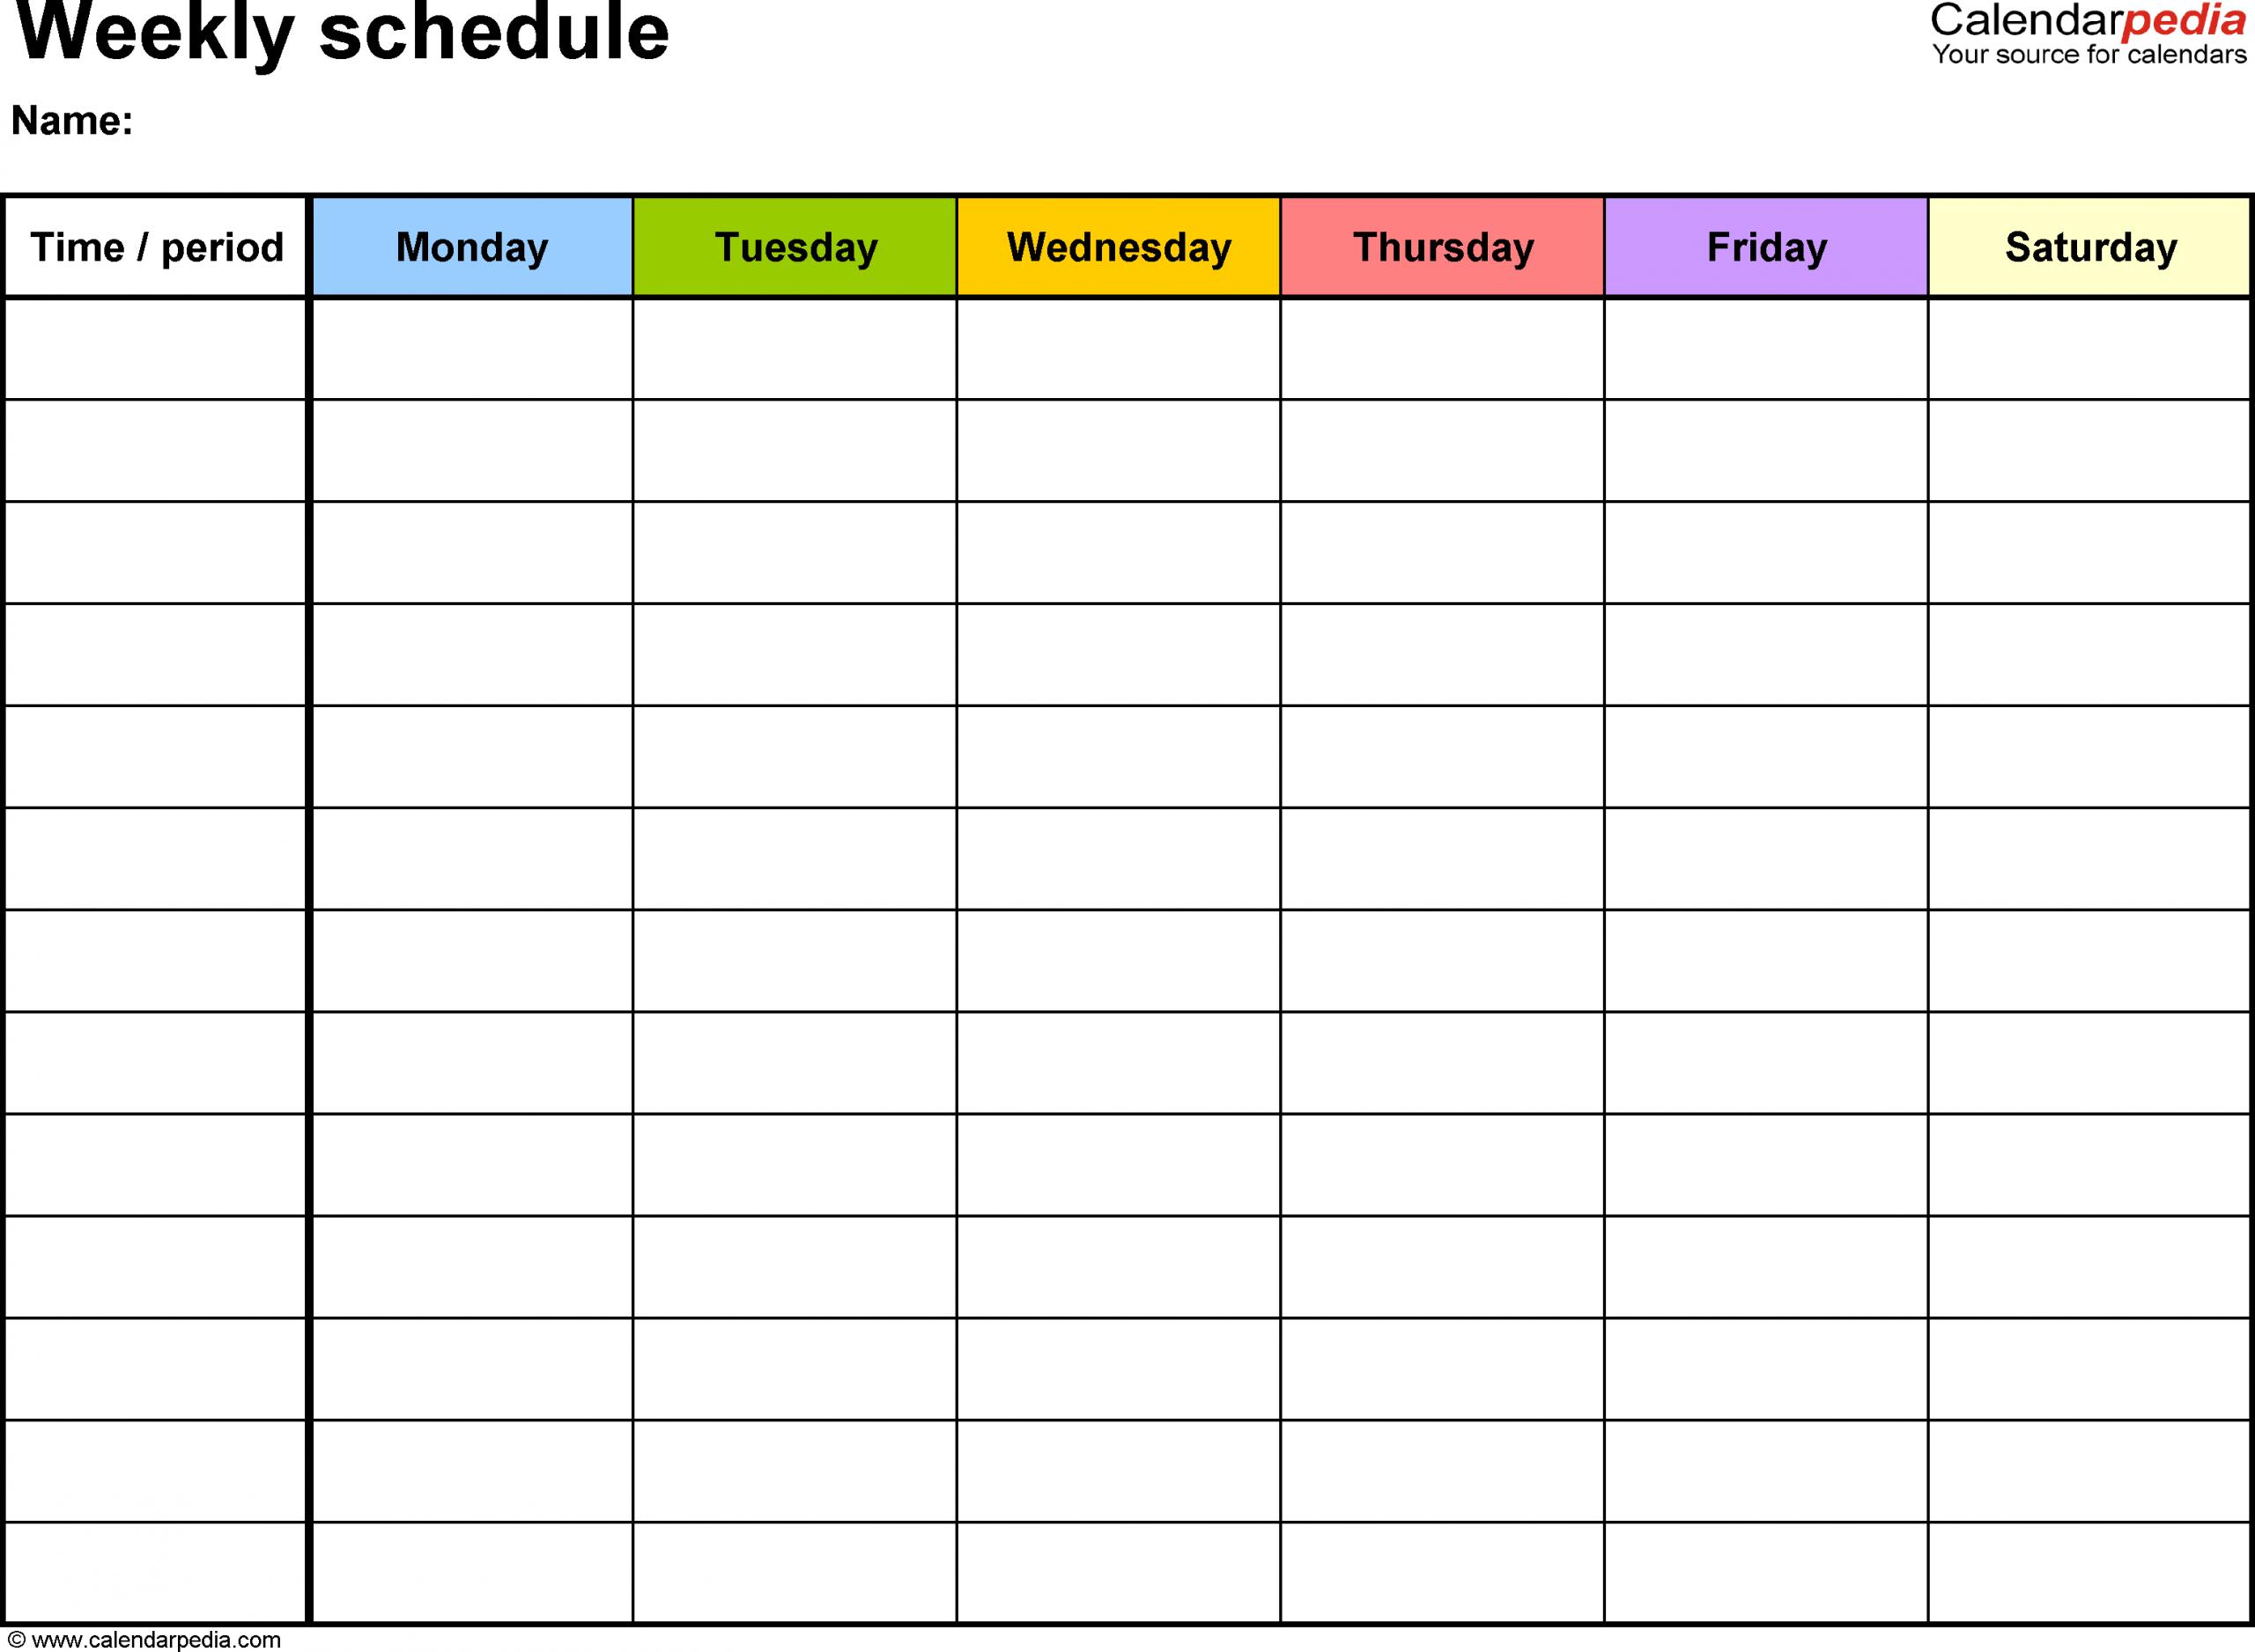 Print Calendar With Time Slots   Calendar Printables Free Short Timer Calendar Template